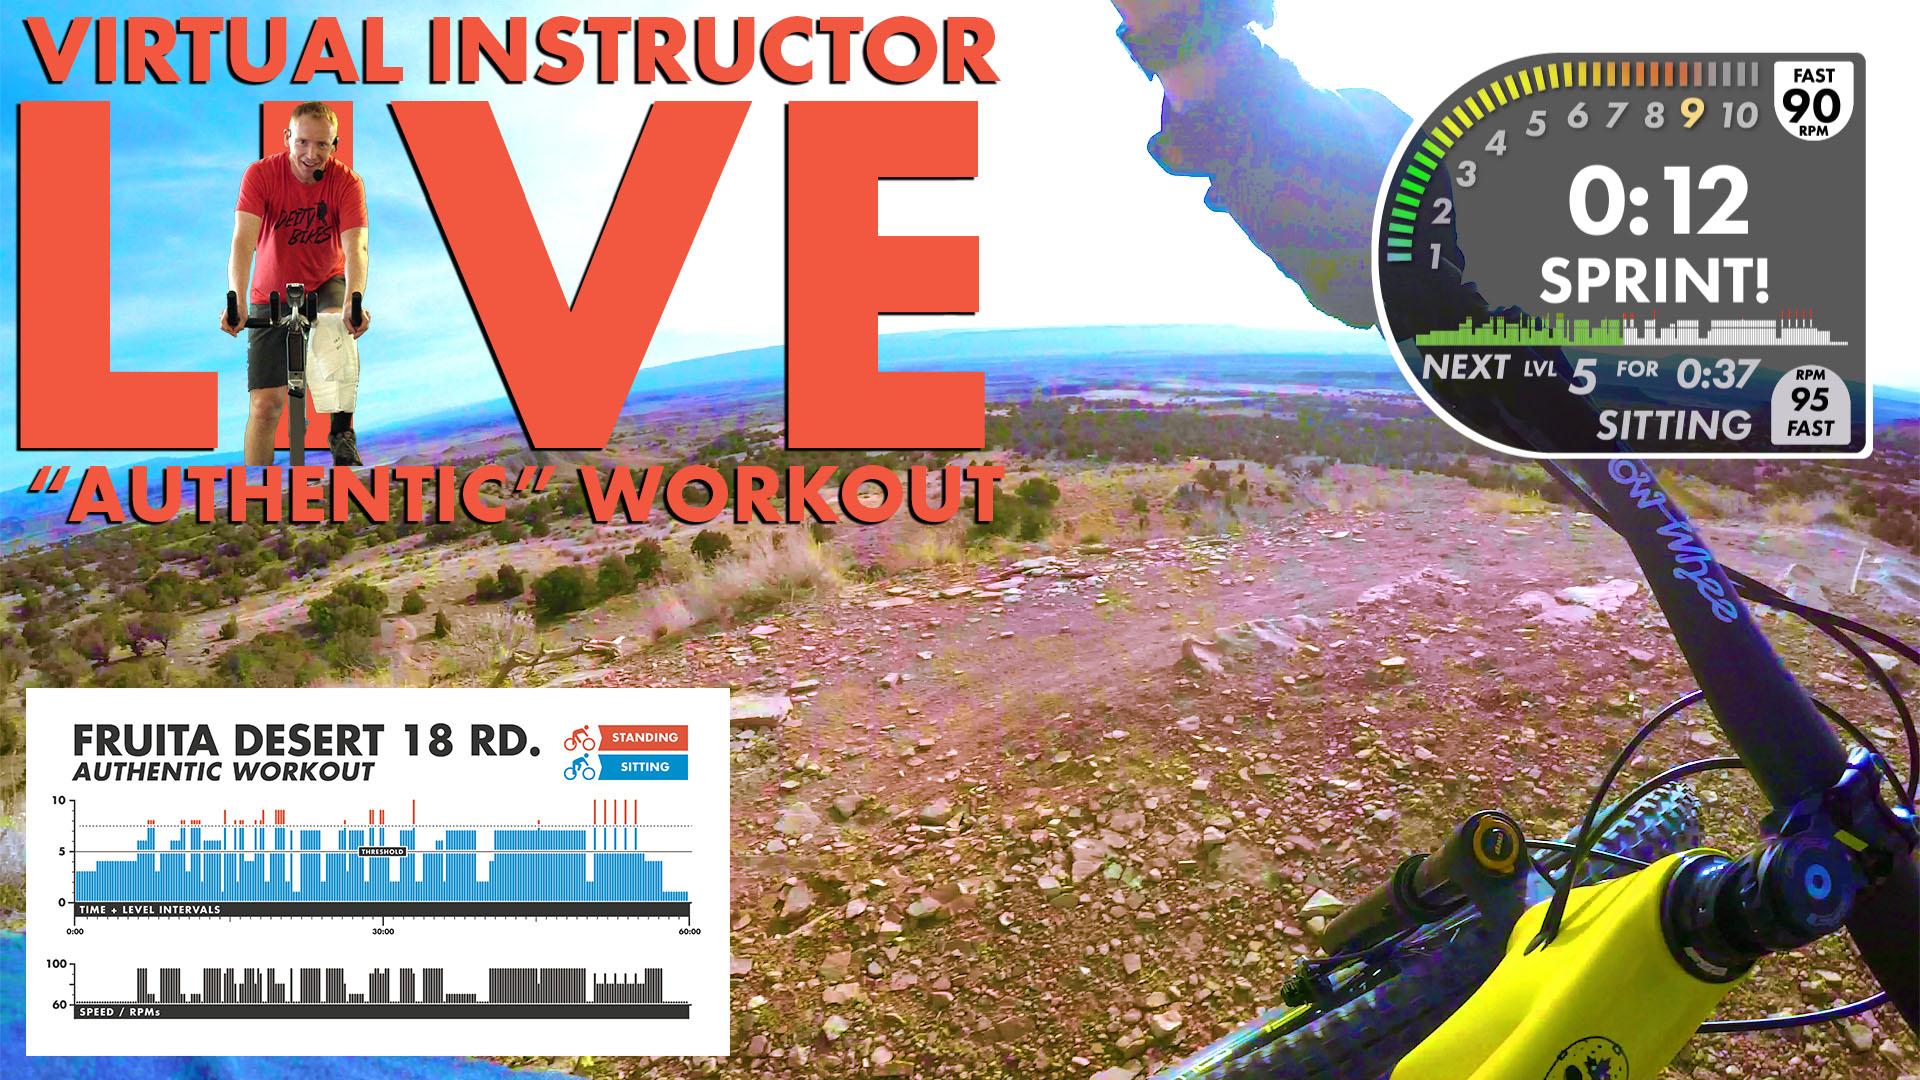 18 Road FPV Virtual Instructor W-Info Graphic.jpg